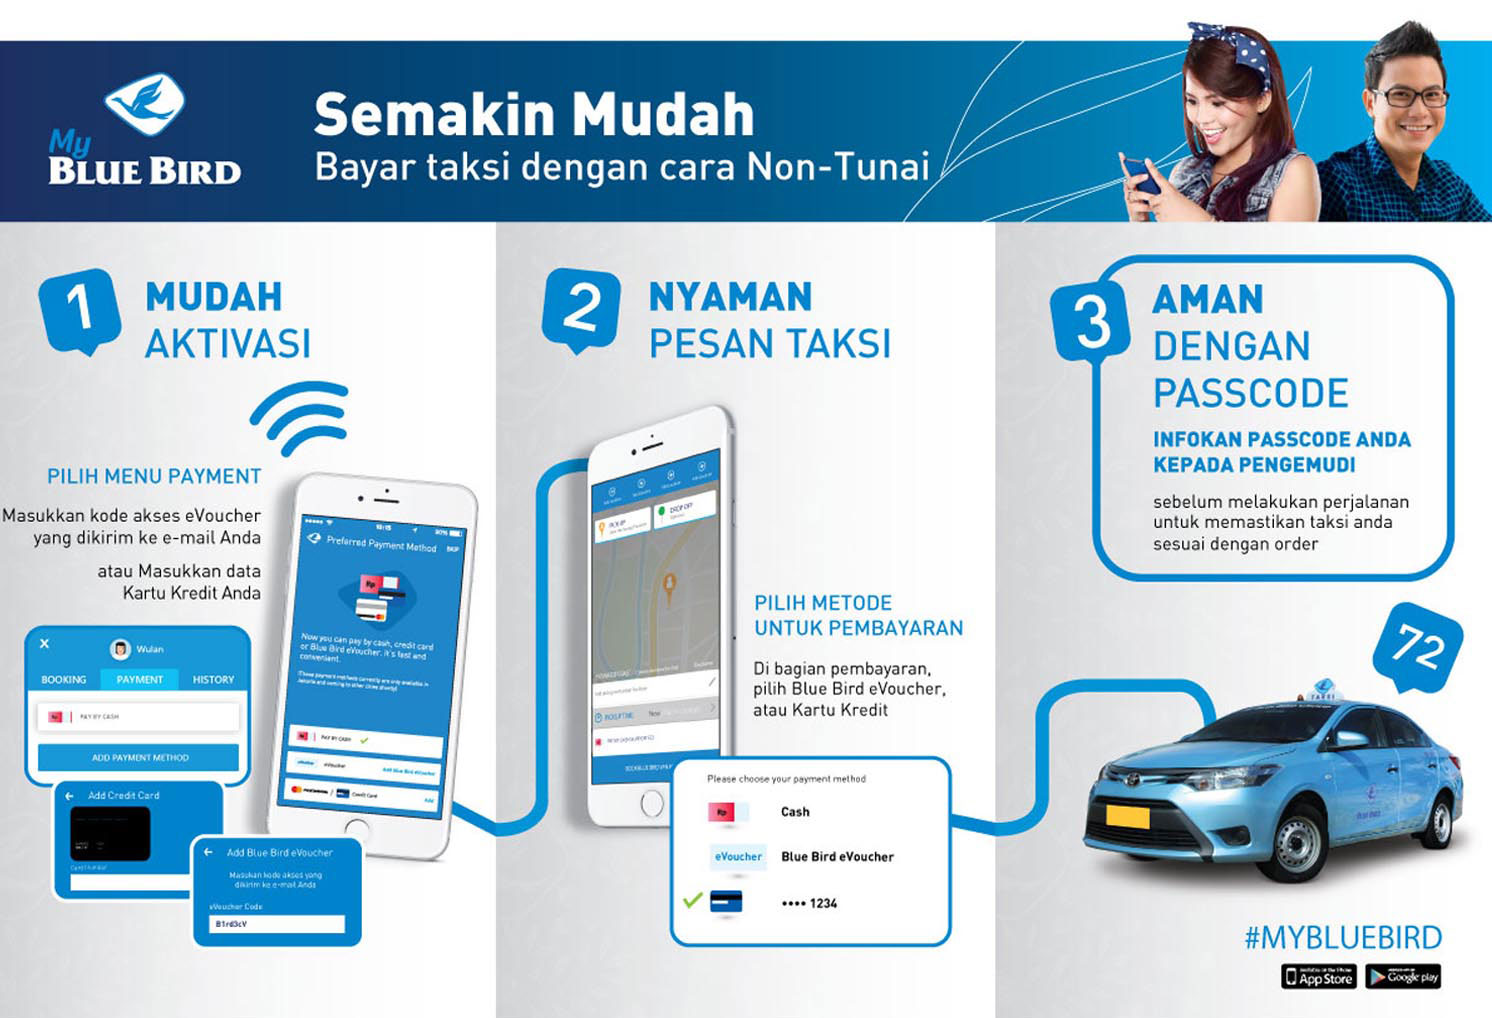 http://thepowerofjatim.blogspot.co.id/2017/06/taxi-blue-bird-surabaya-order-mudah.html